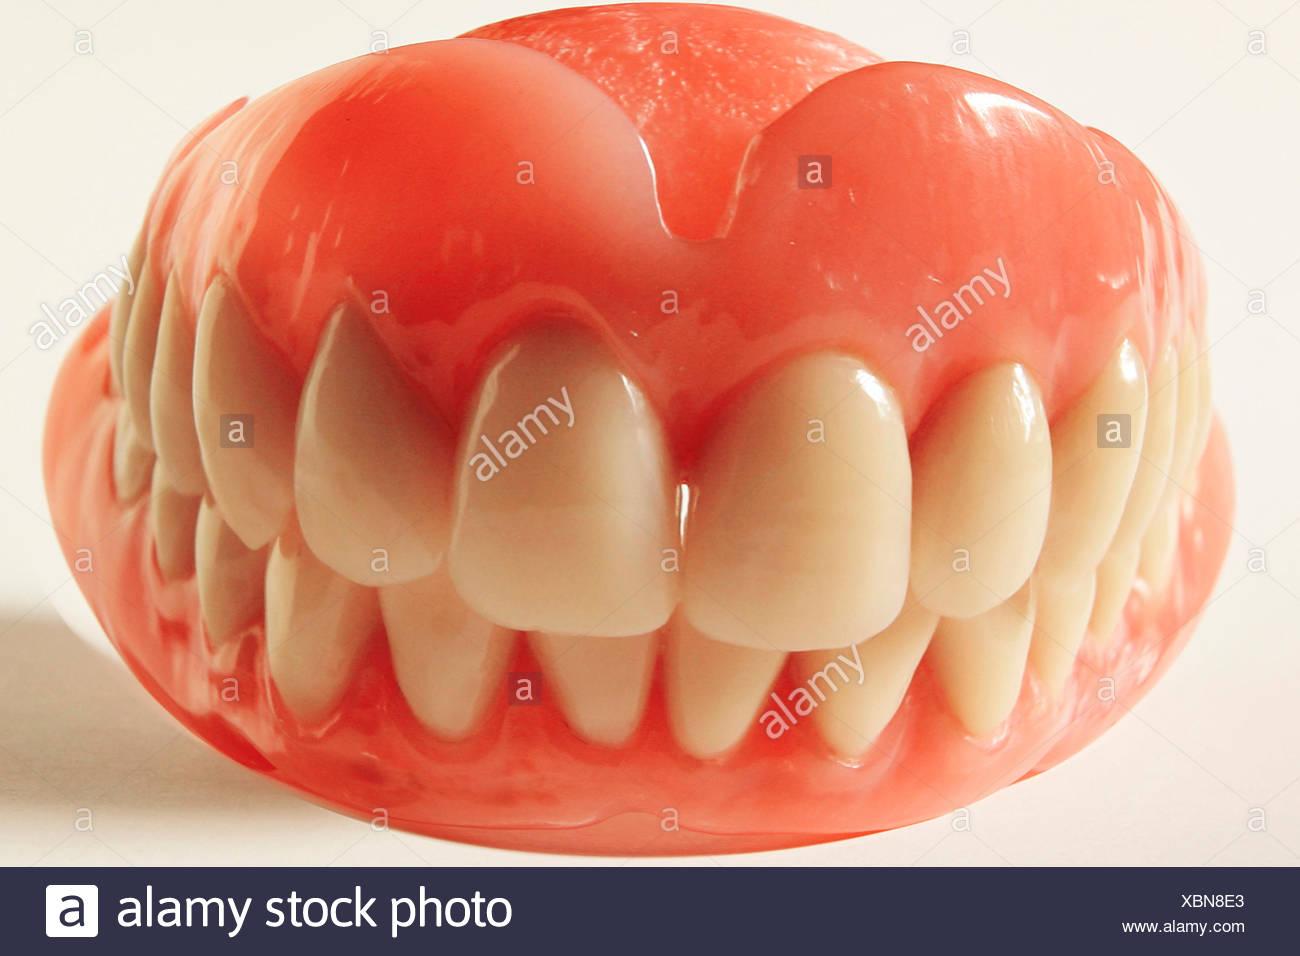 artificial denture - Stock Image